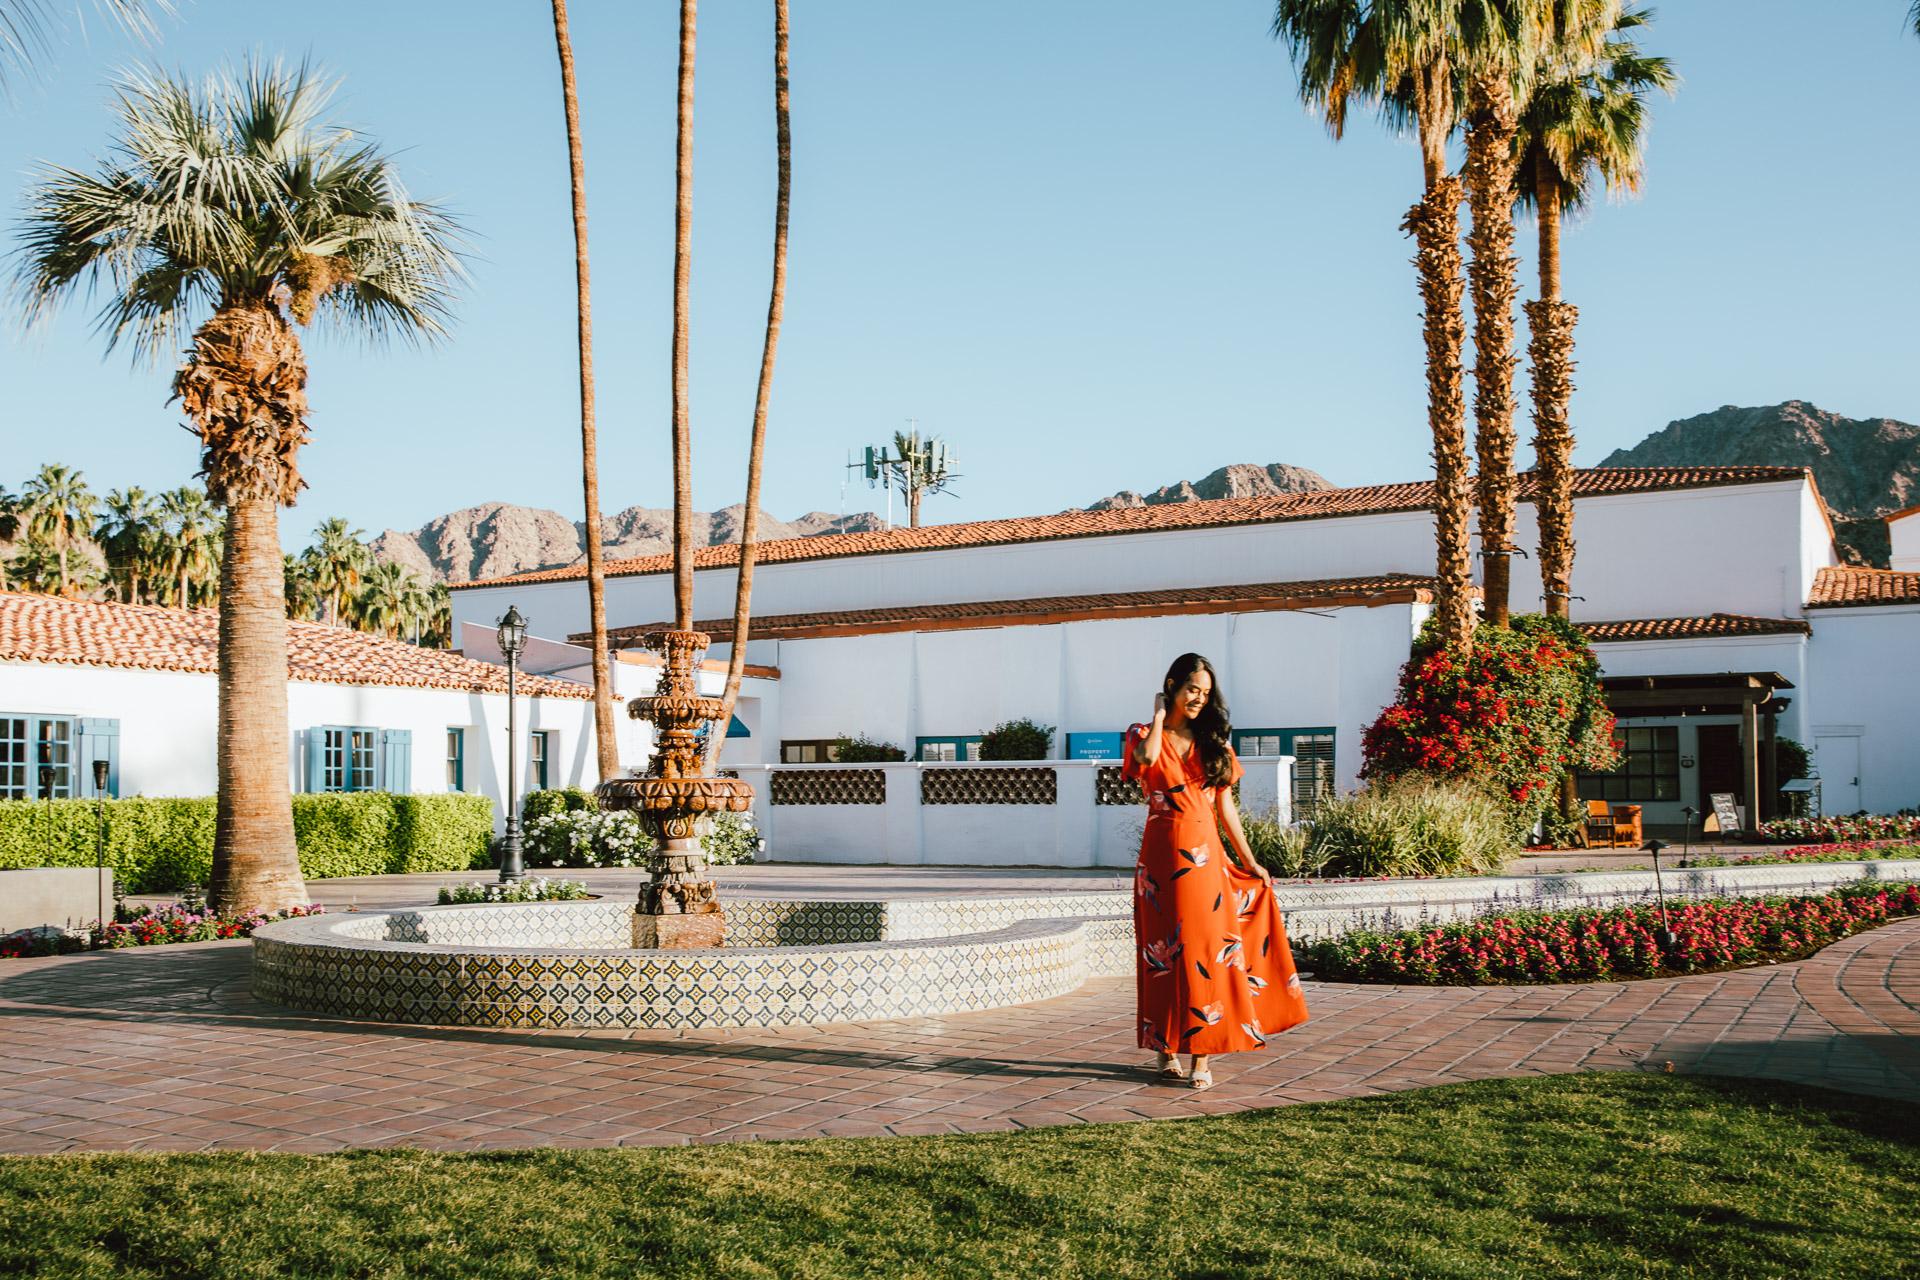 palm-springs-california-hotel-lifestyle-photographer-la-quinta-resort-club-7.jpg